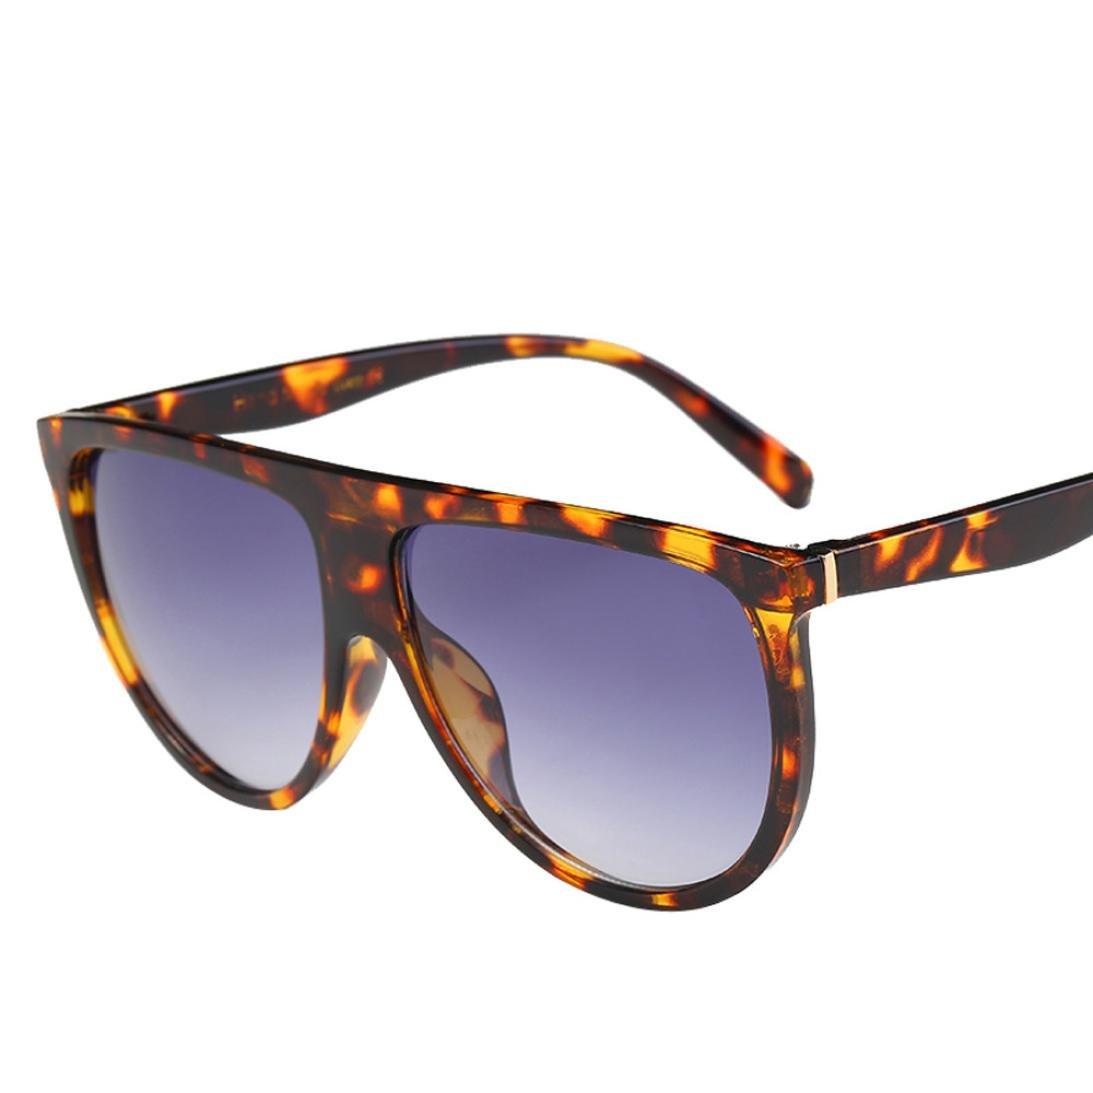 5b5b1c3748 Inverlee Sunglasses Fashion Unisex Vintage Shaded Lens Thin Glasses Fashion  Aviator Sunglasses (A) at Amazon Women s Clothing store